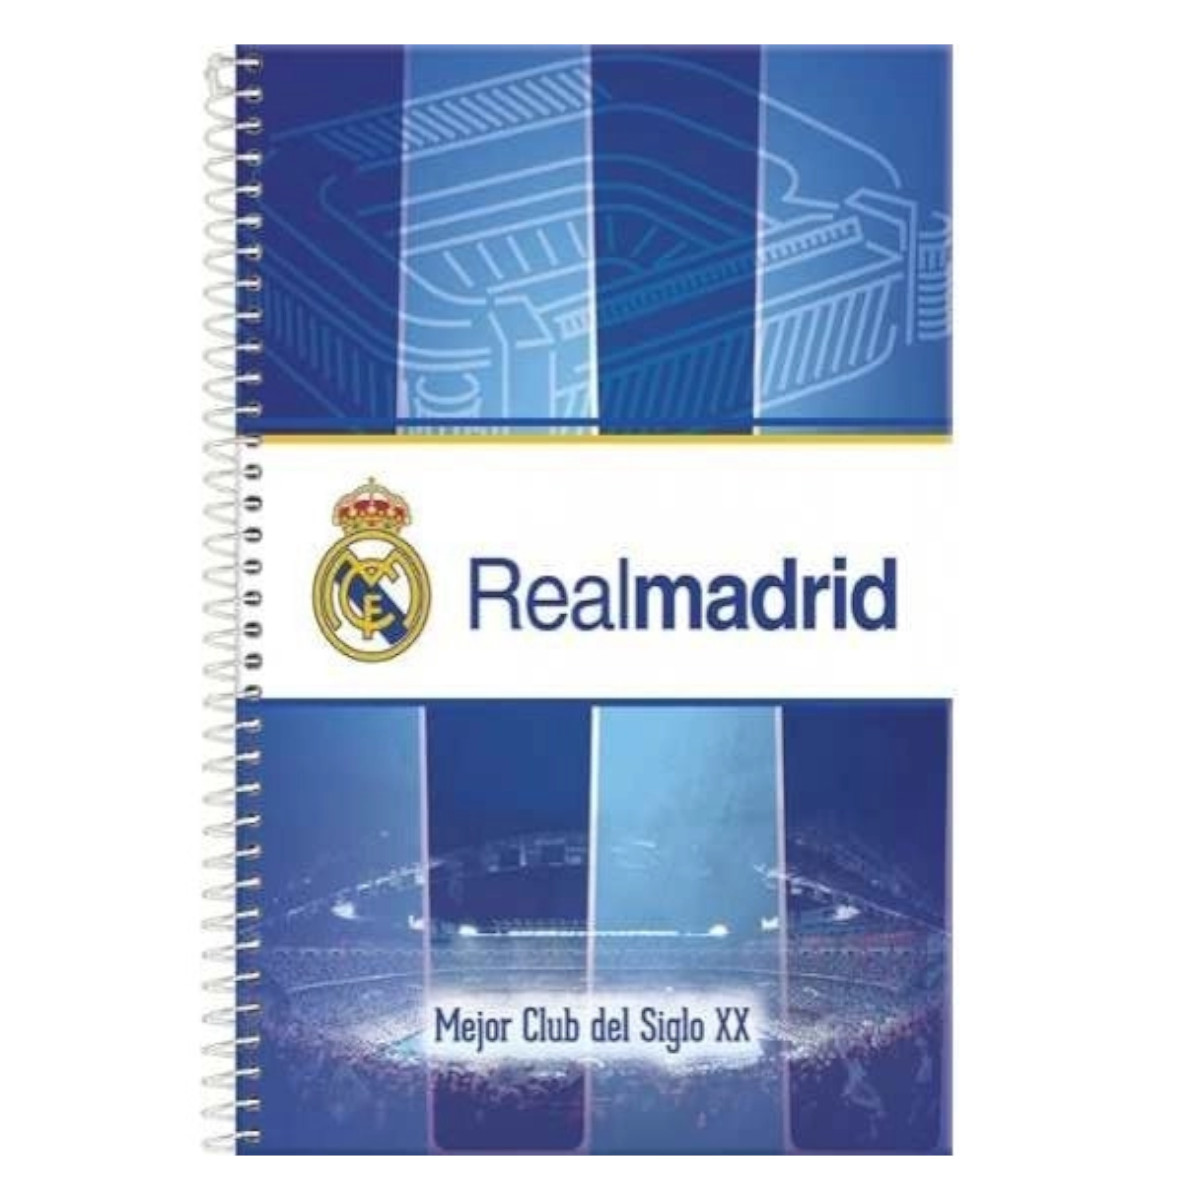 CADERNO REAL MADRID 10 MATÉRIAS 200 FOLHAS FORONI